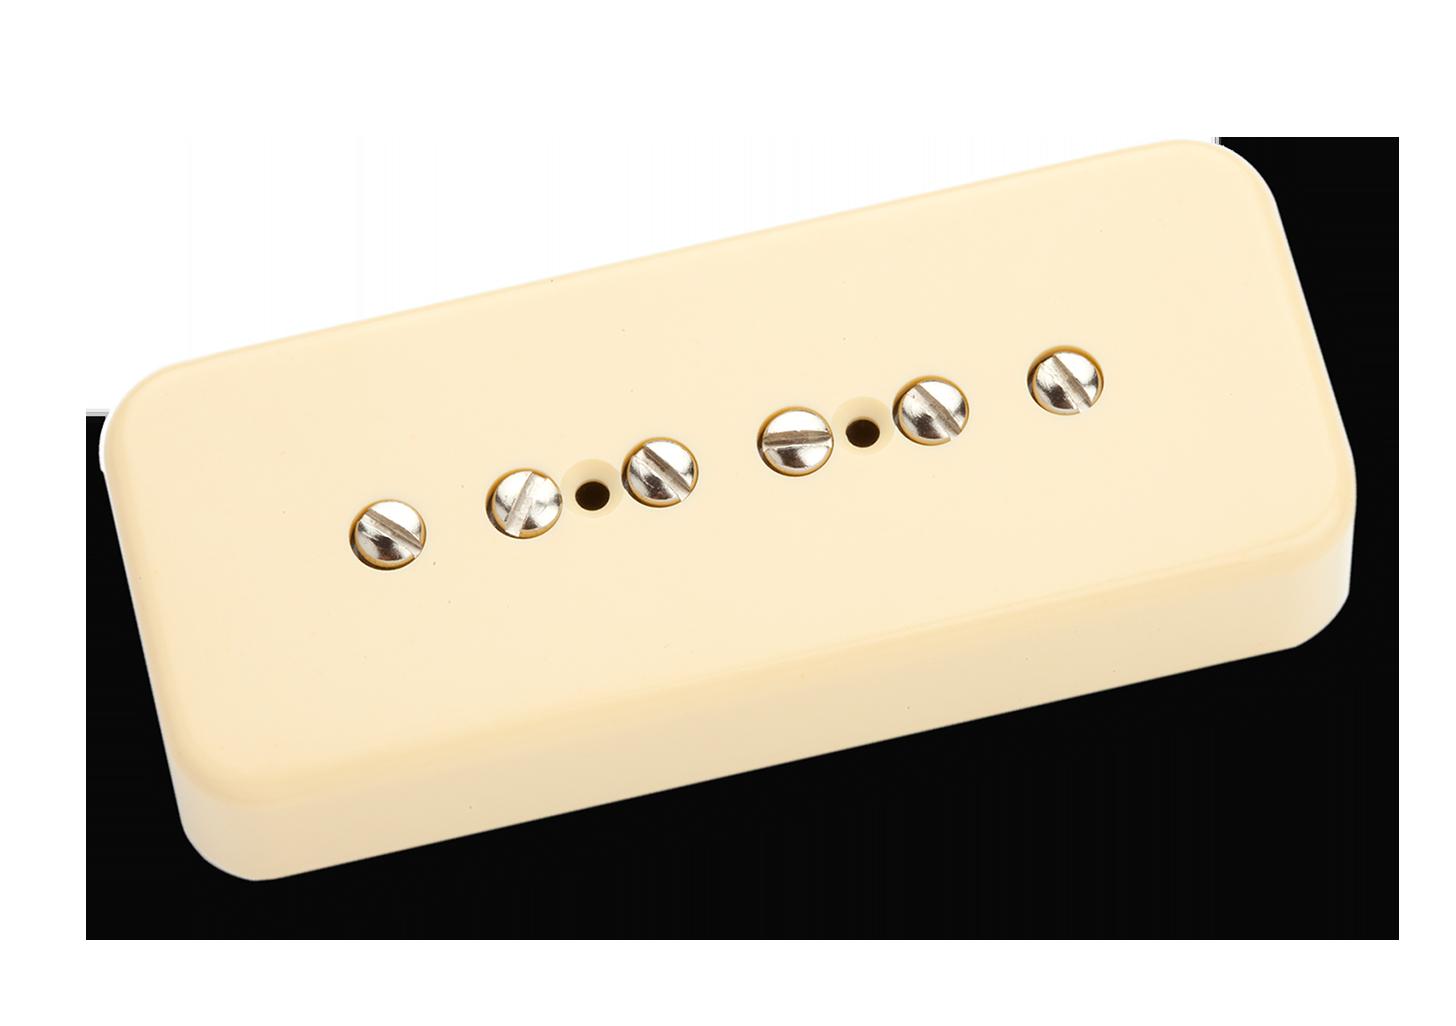 Seymour Duncan Custom P90 SP90-3B Bridge Cream